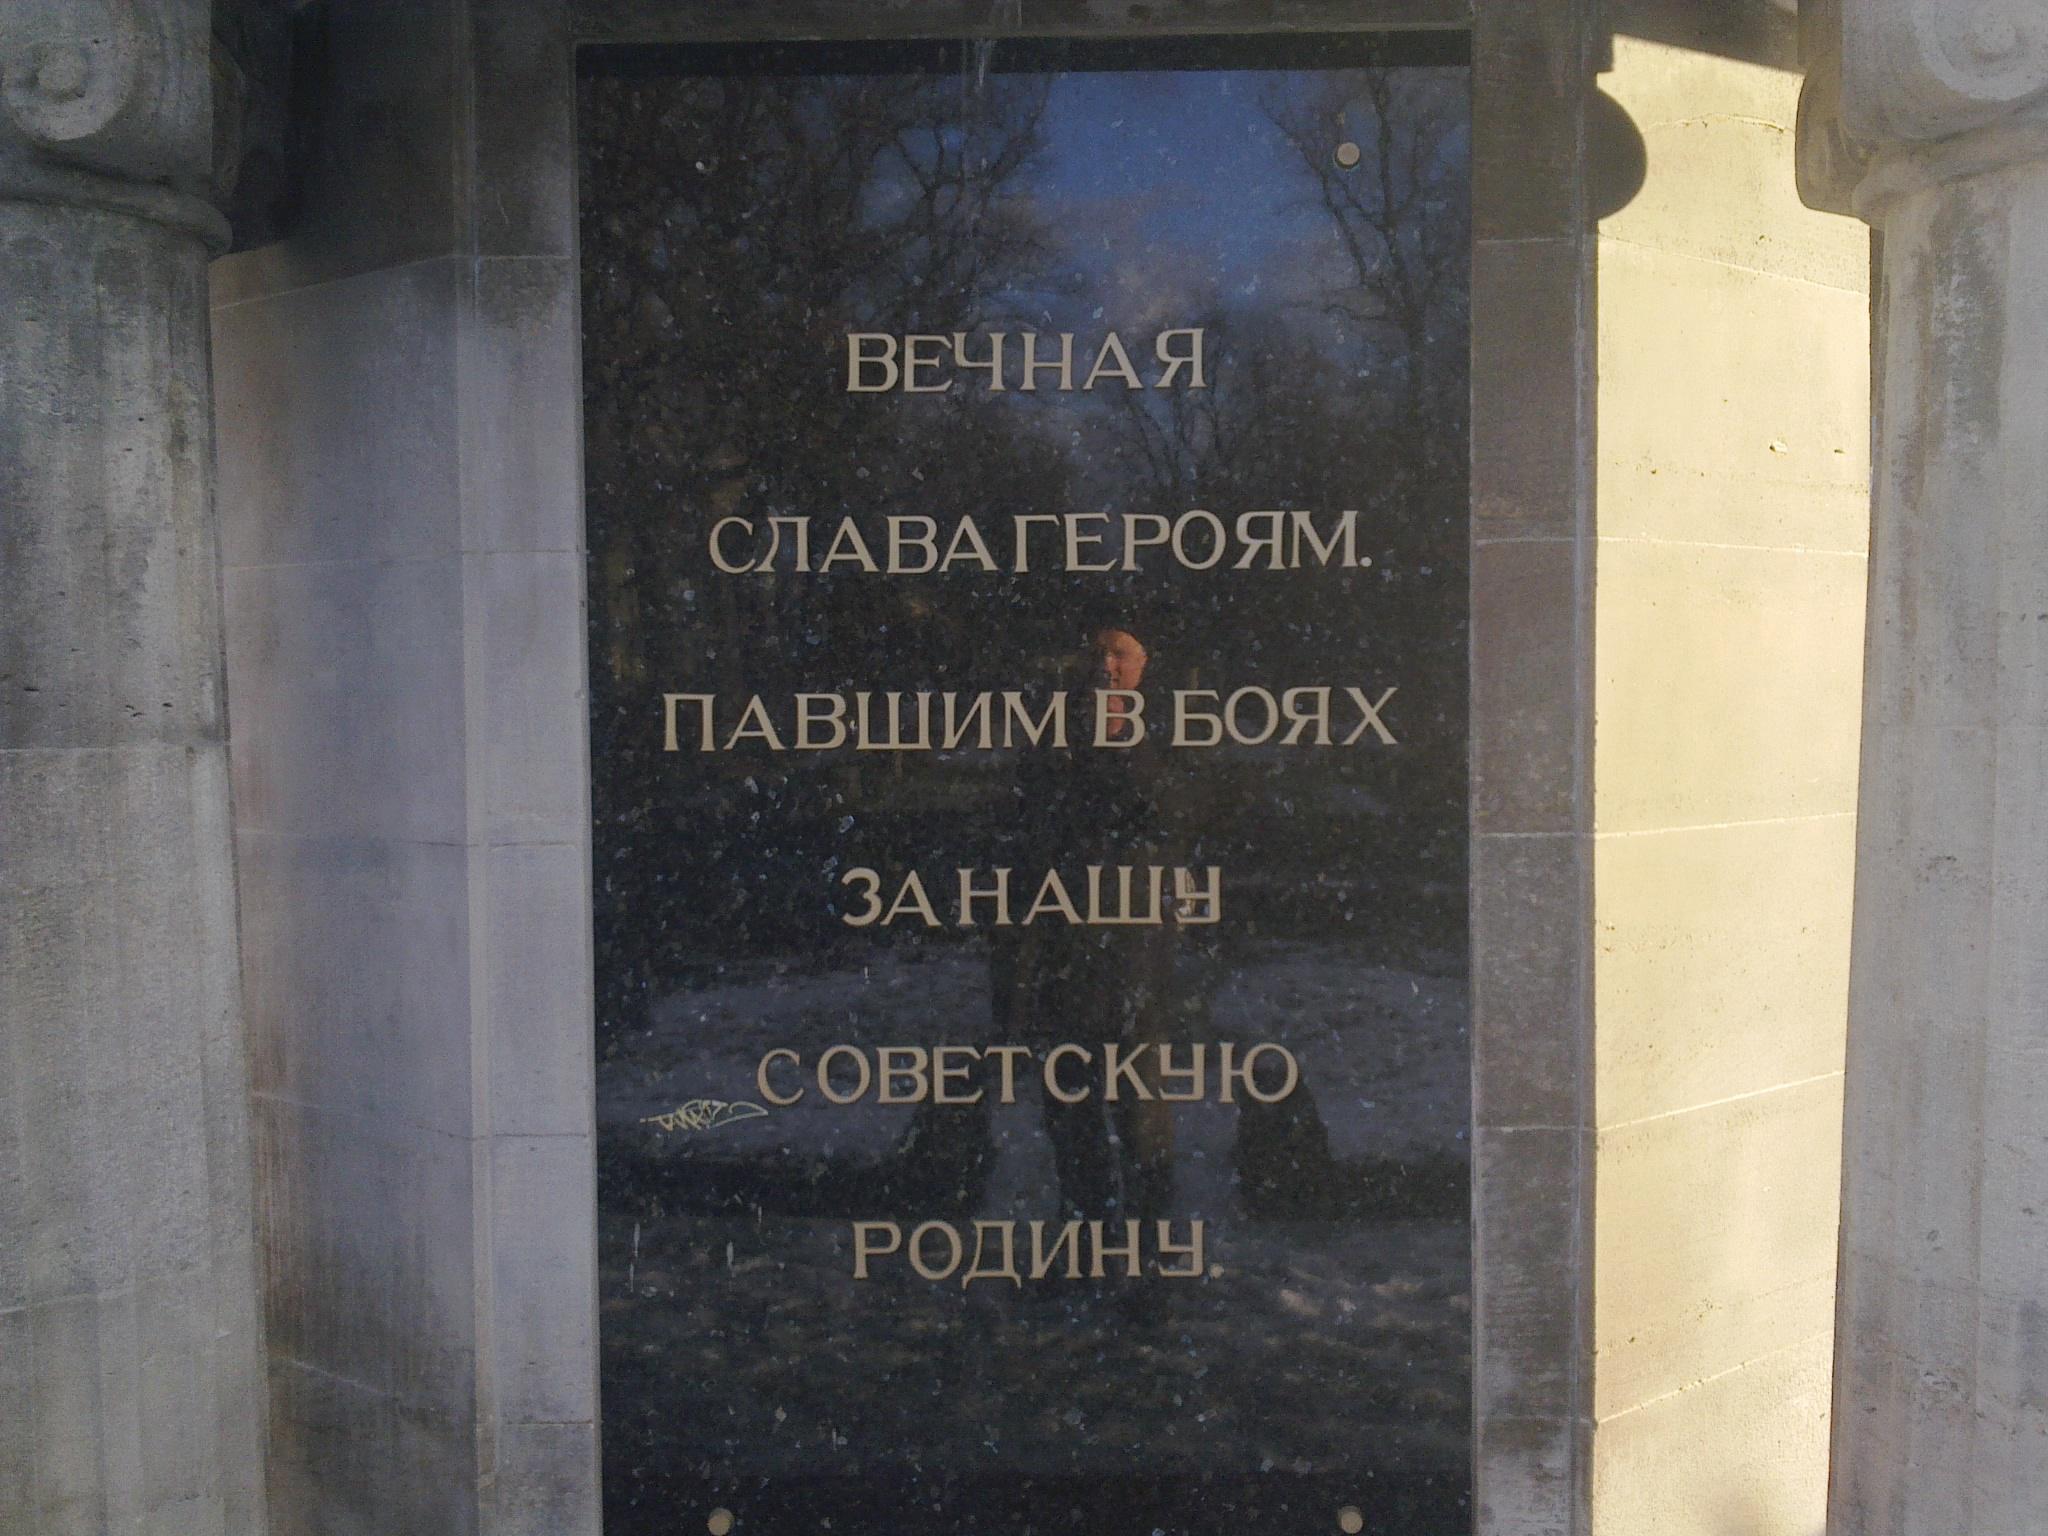 ewiger-ruhm-fur-die-sowjetische-heimat-150220121584.jpg